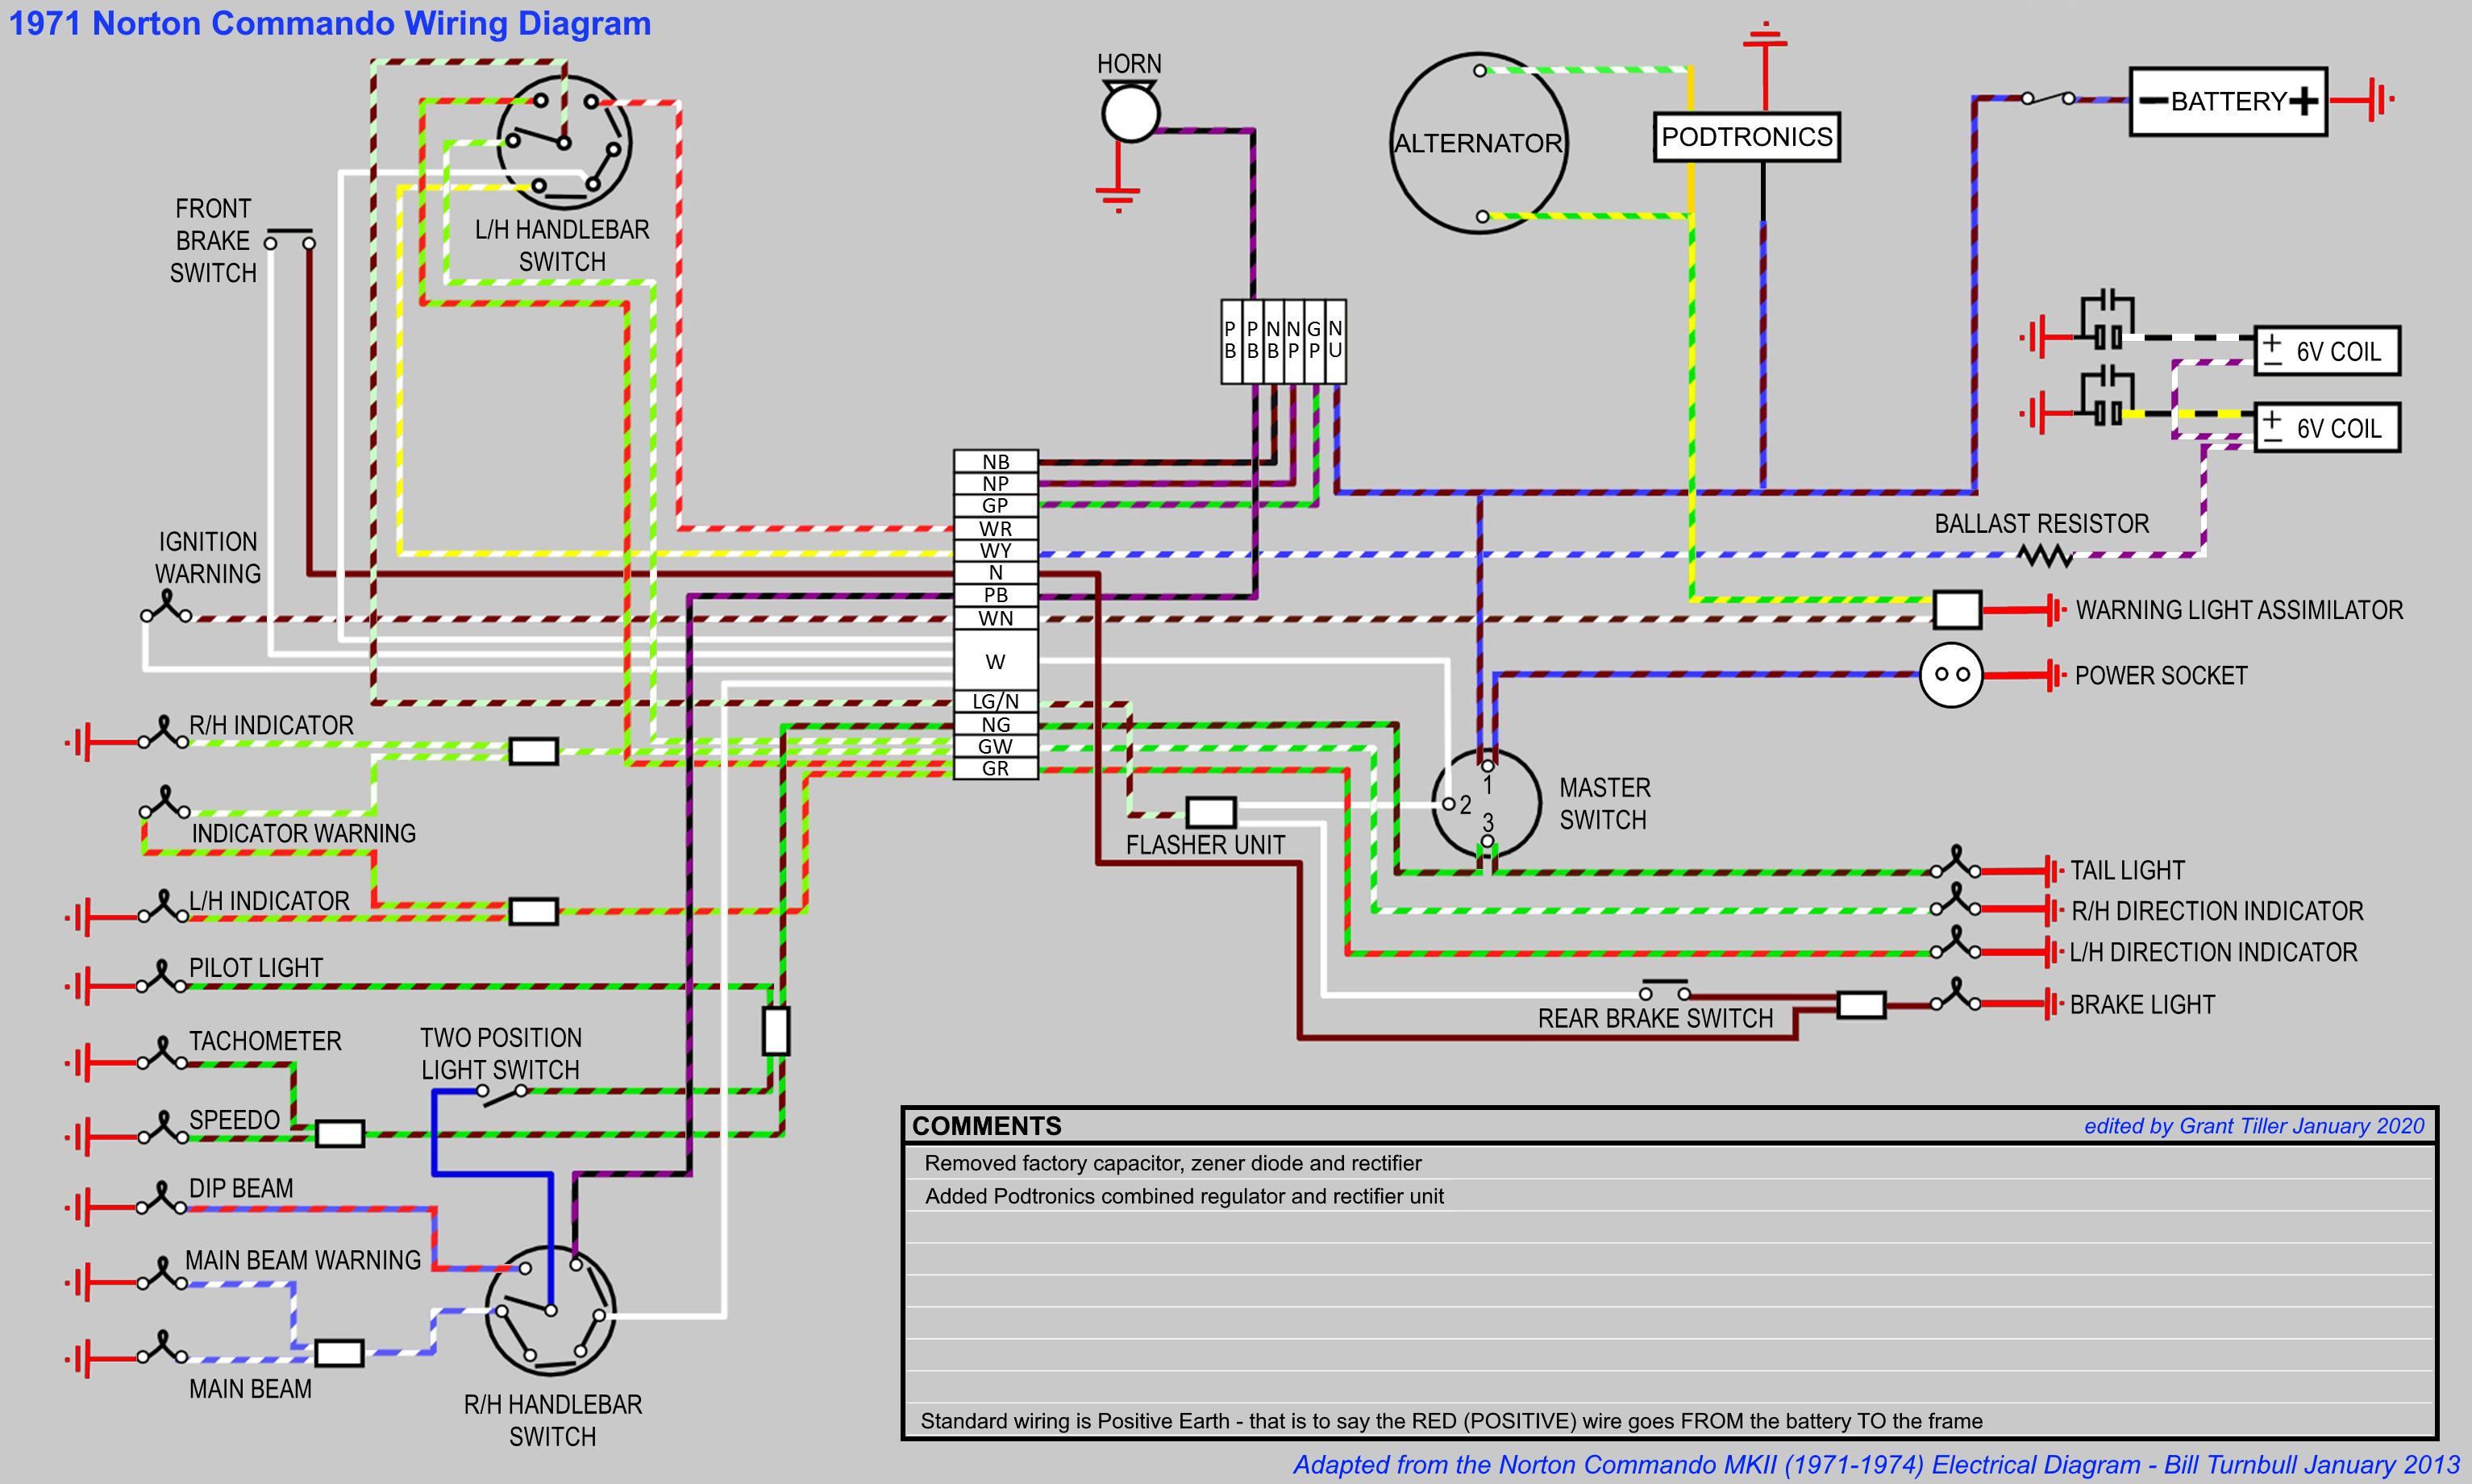 Norton Commando Wiring Diagram Podtronics